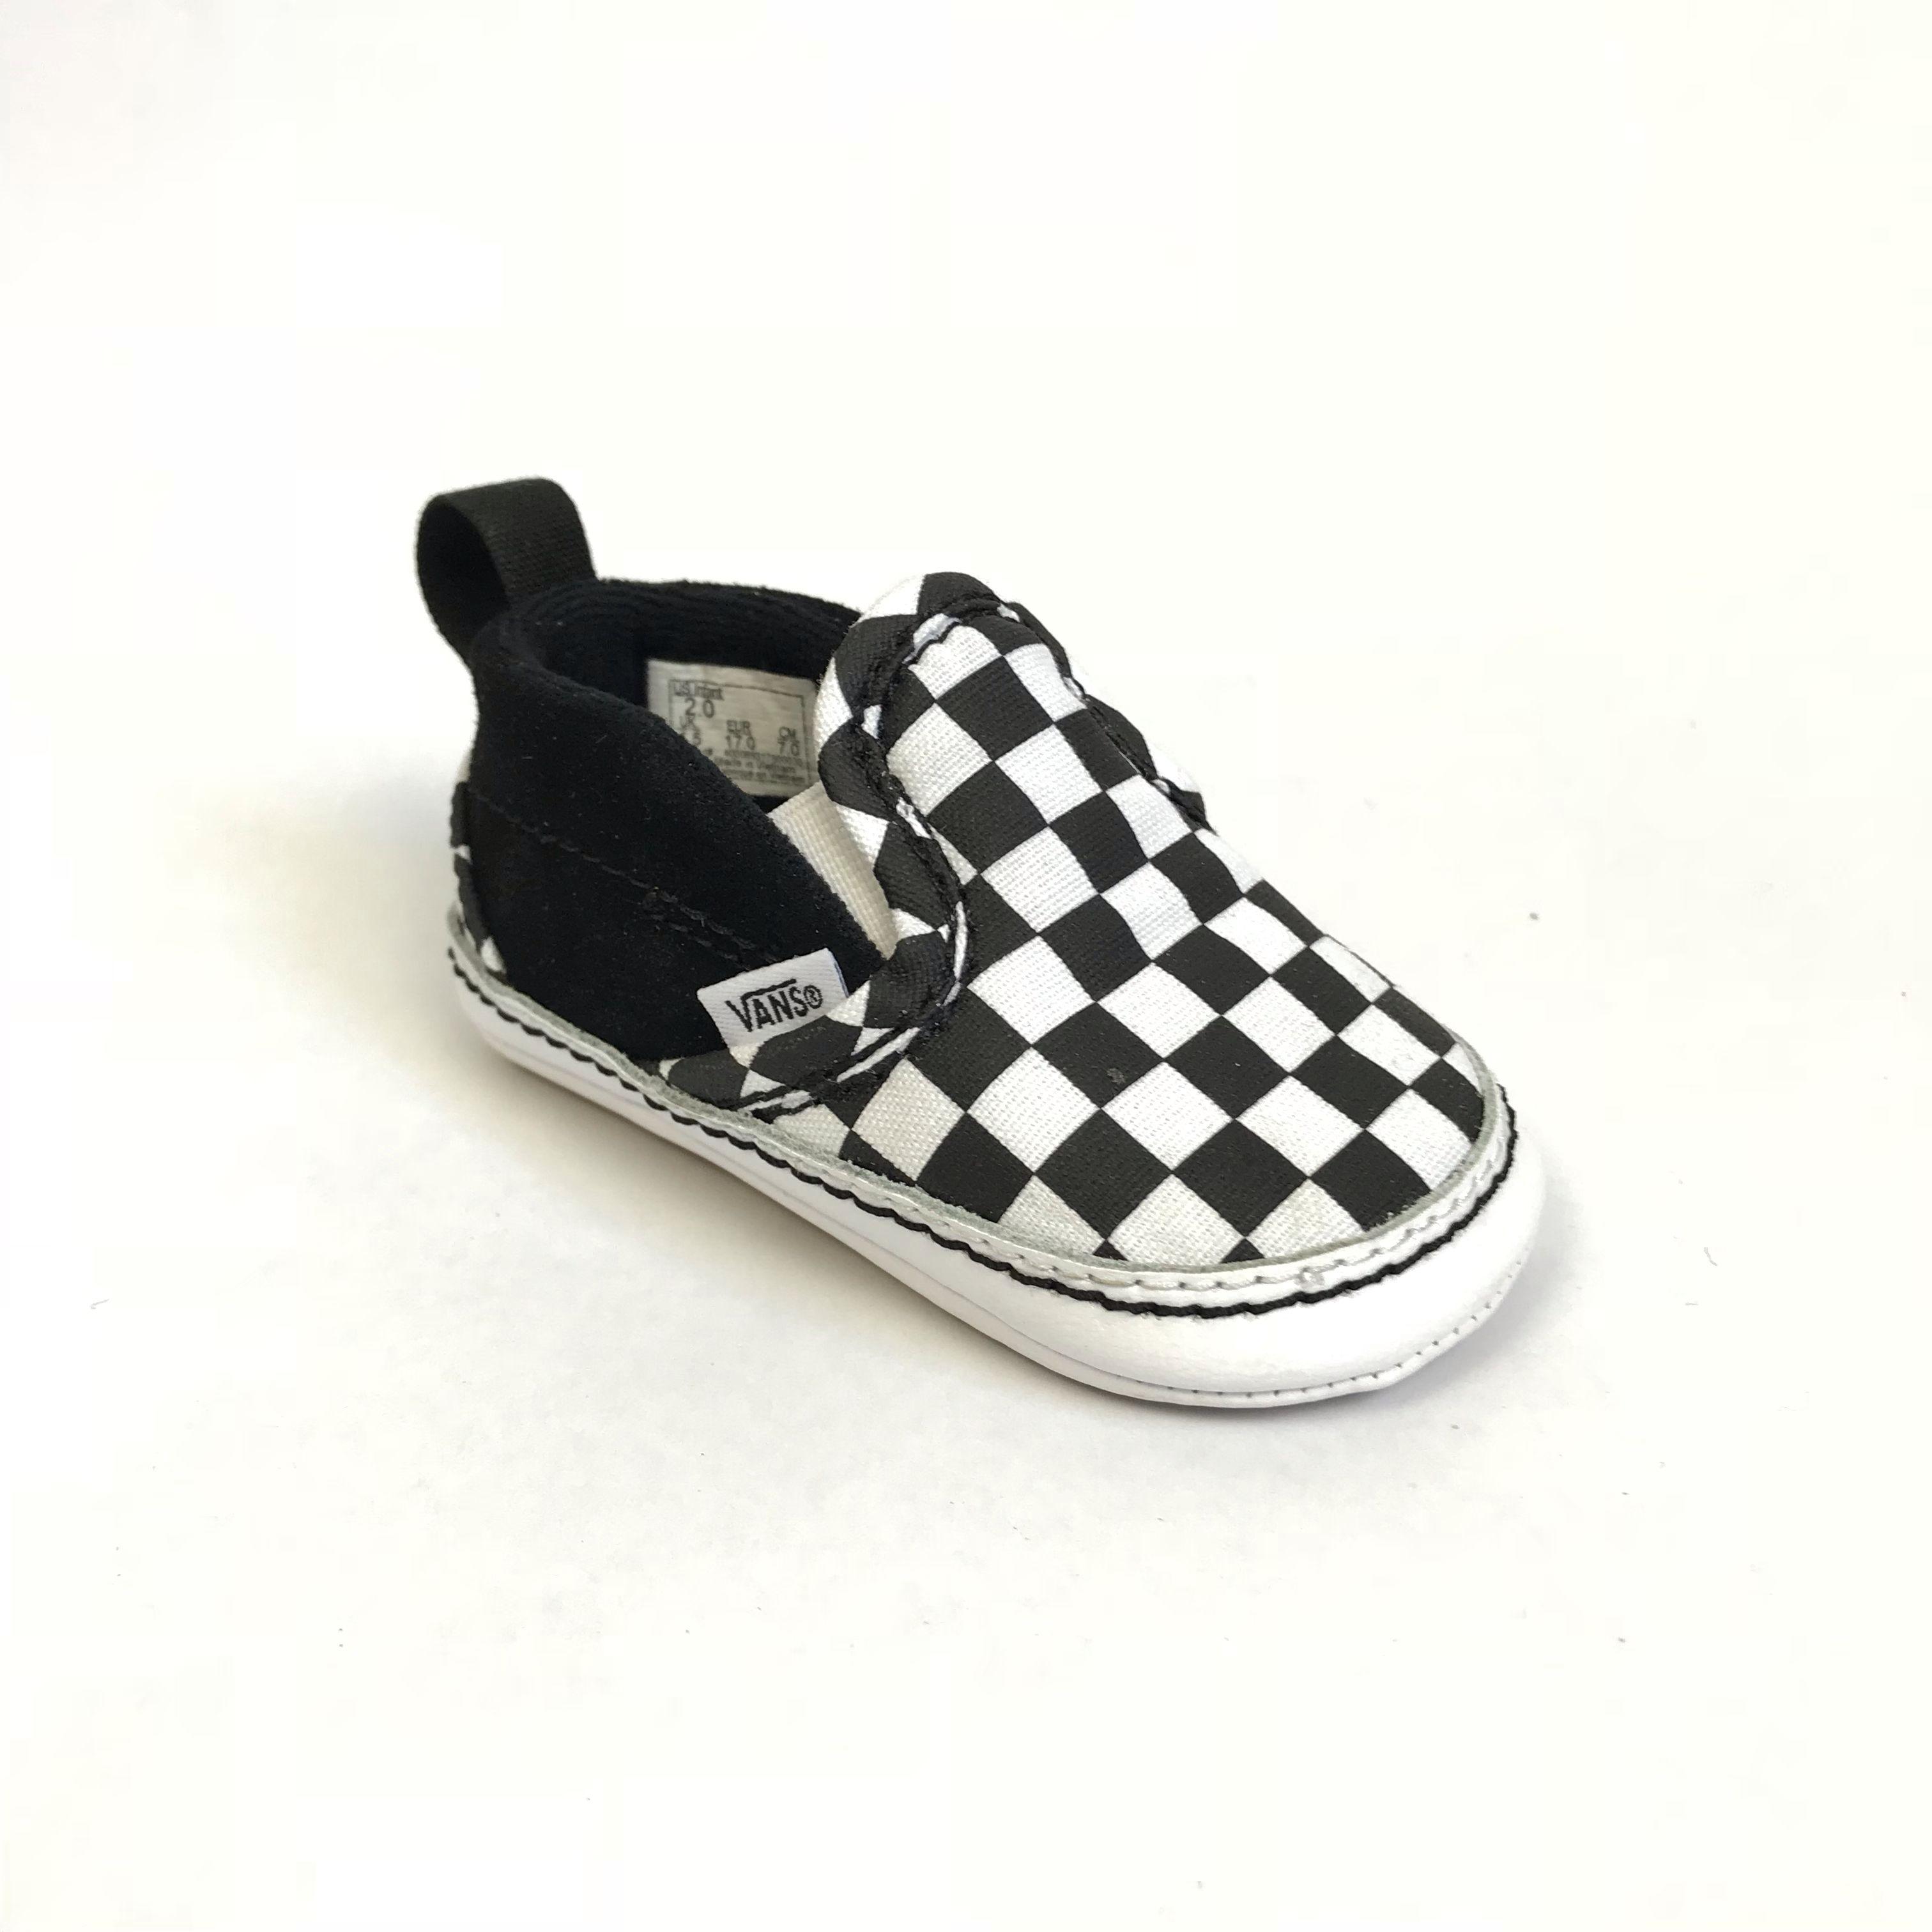 Vans Crib Shoe | Vans shoes kids, Crib